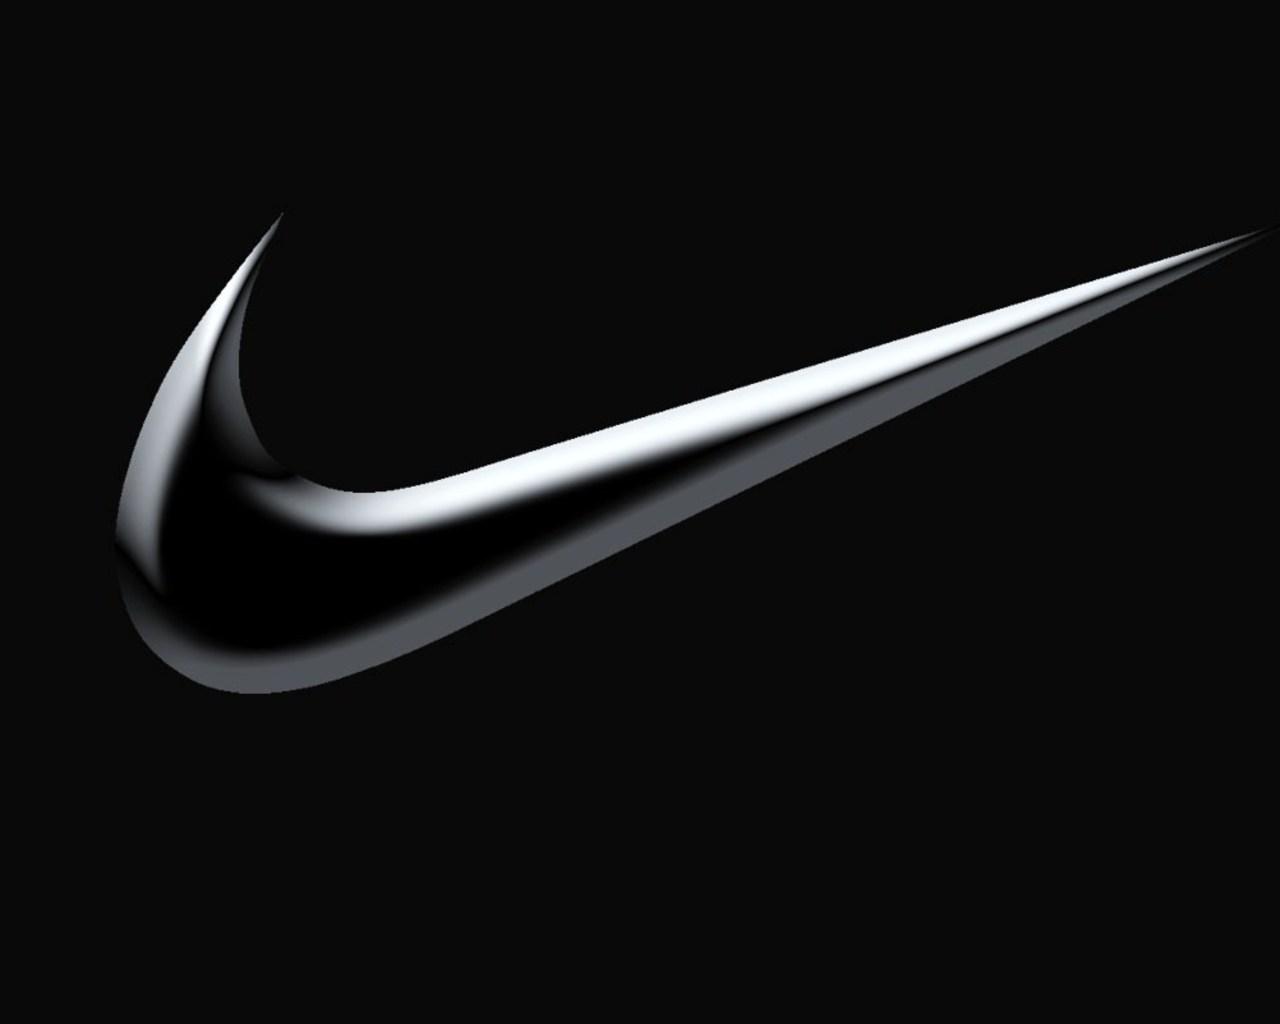 Nike Logo Wallpaper 5175 Hd Wallpapers in Logos   Imagescicom 1280x1024